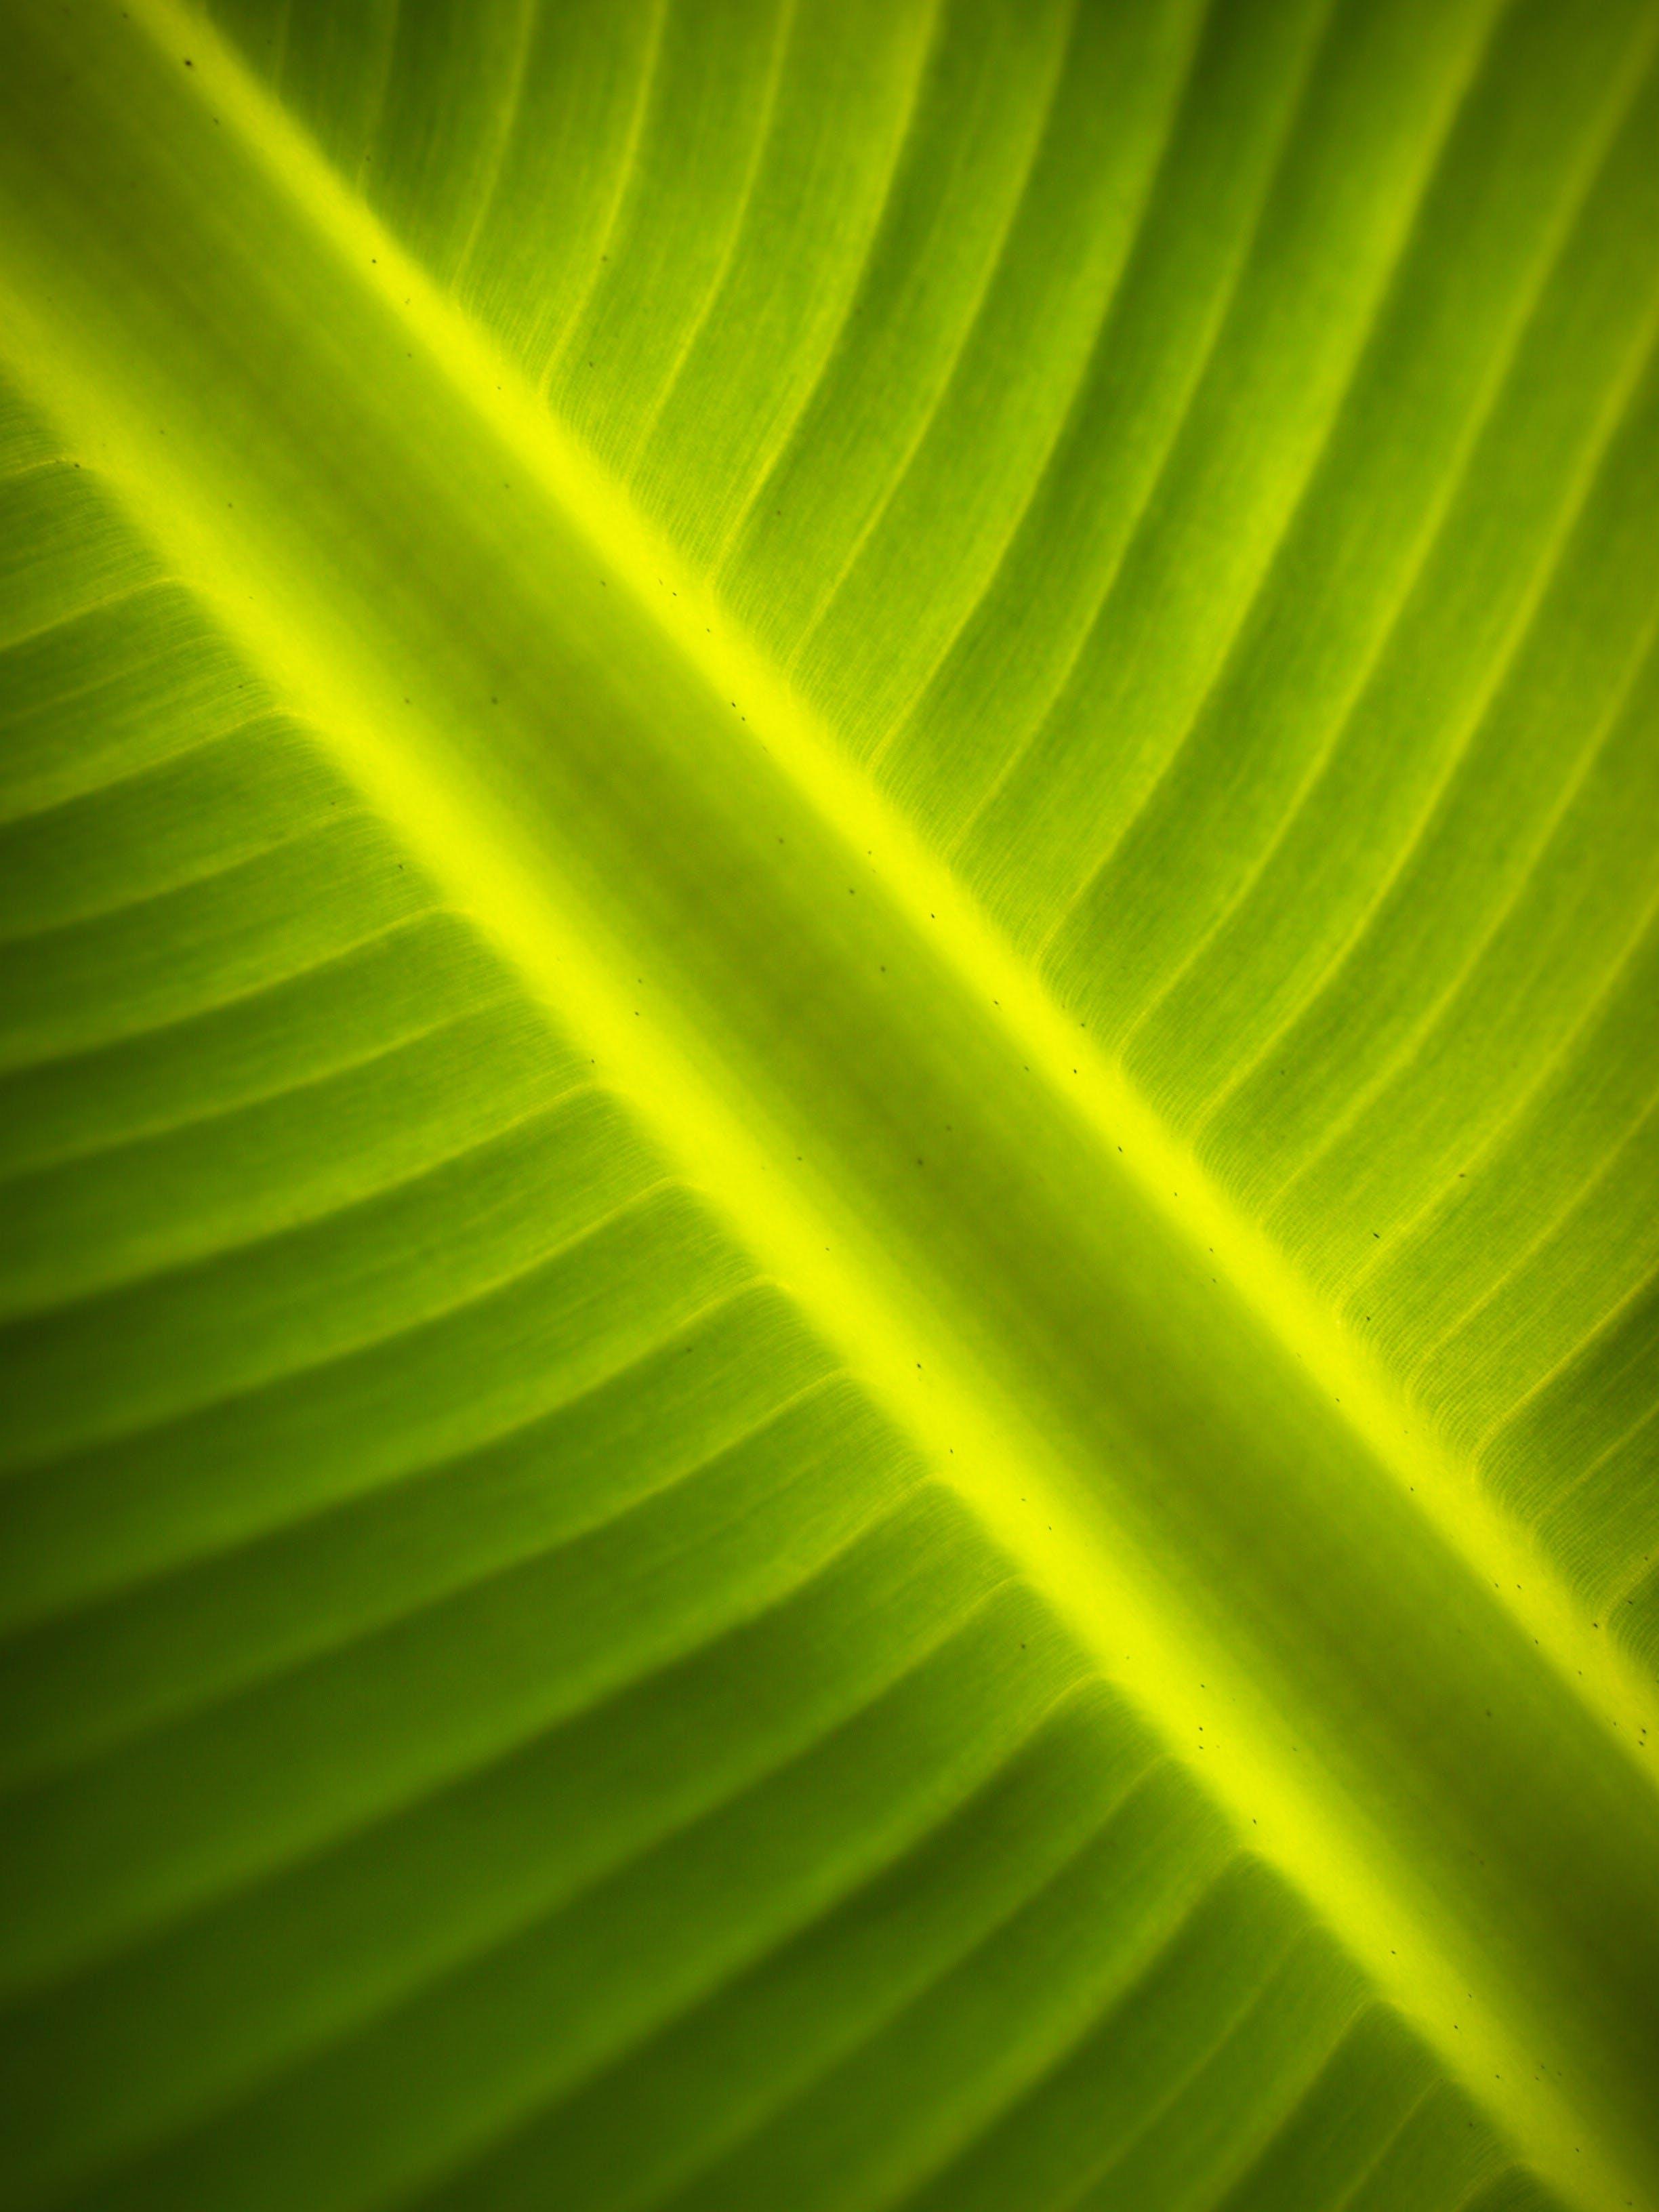 Close-up Photography of Green Banana Leaf